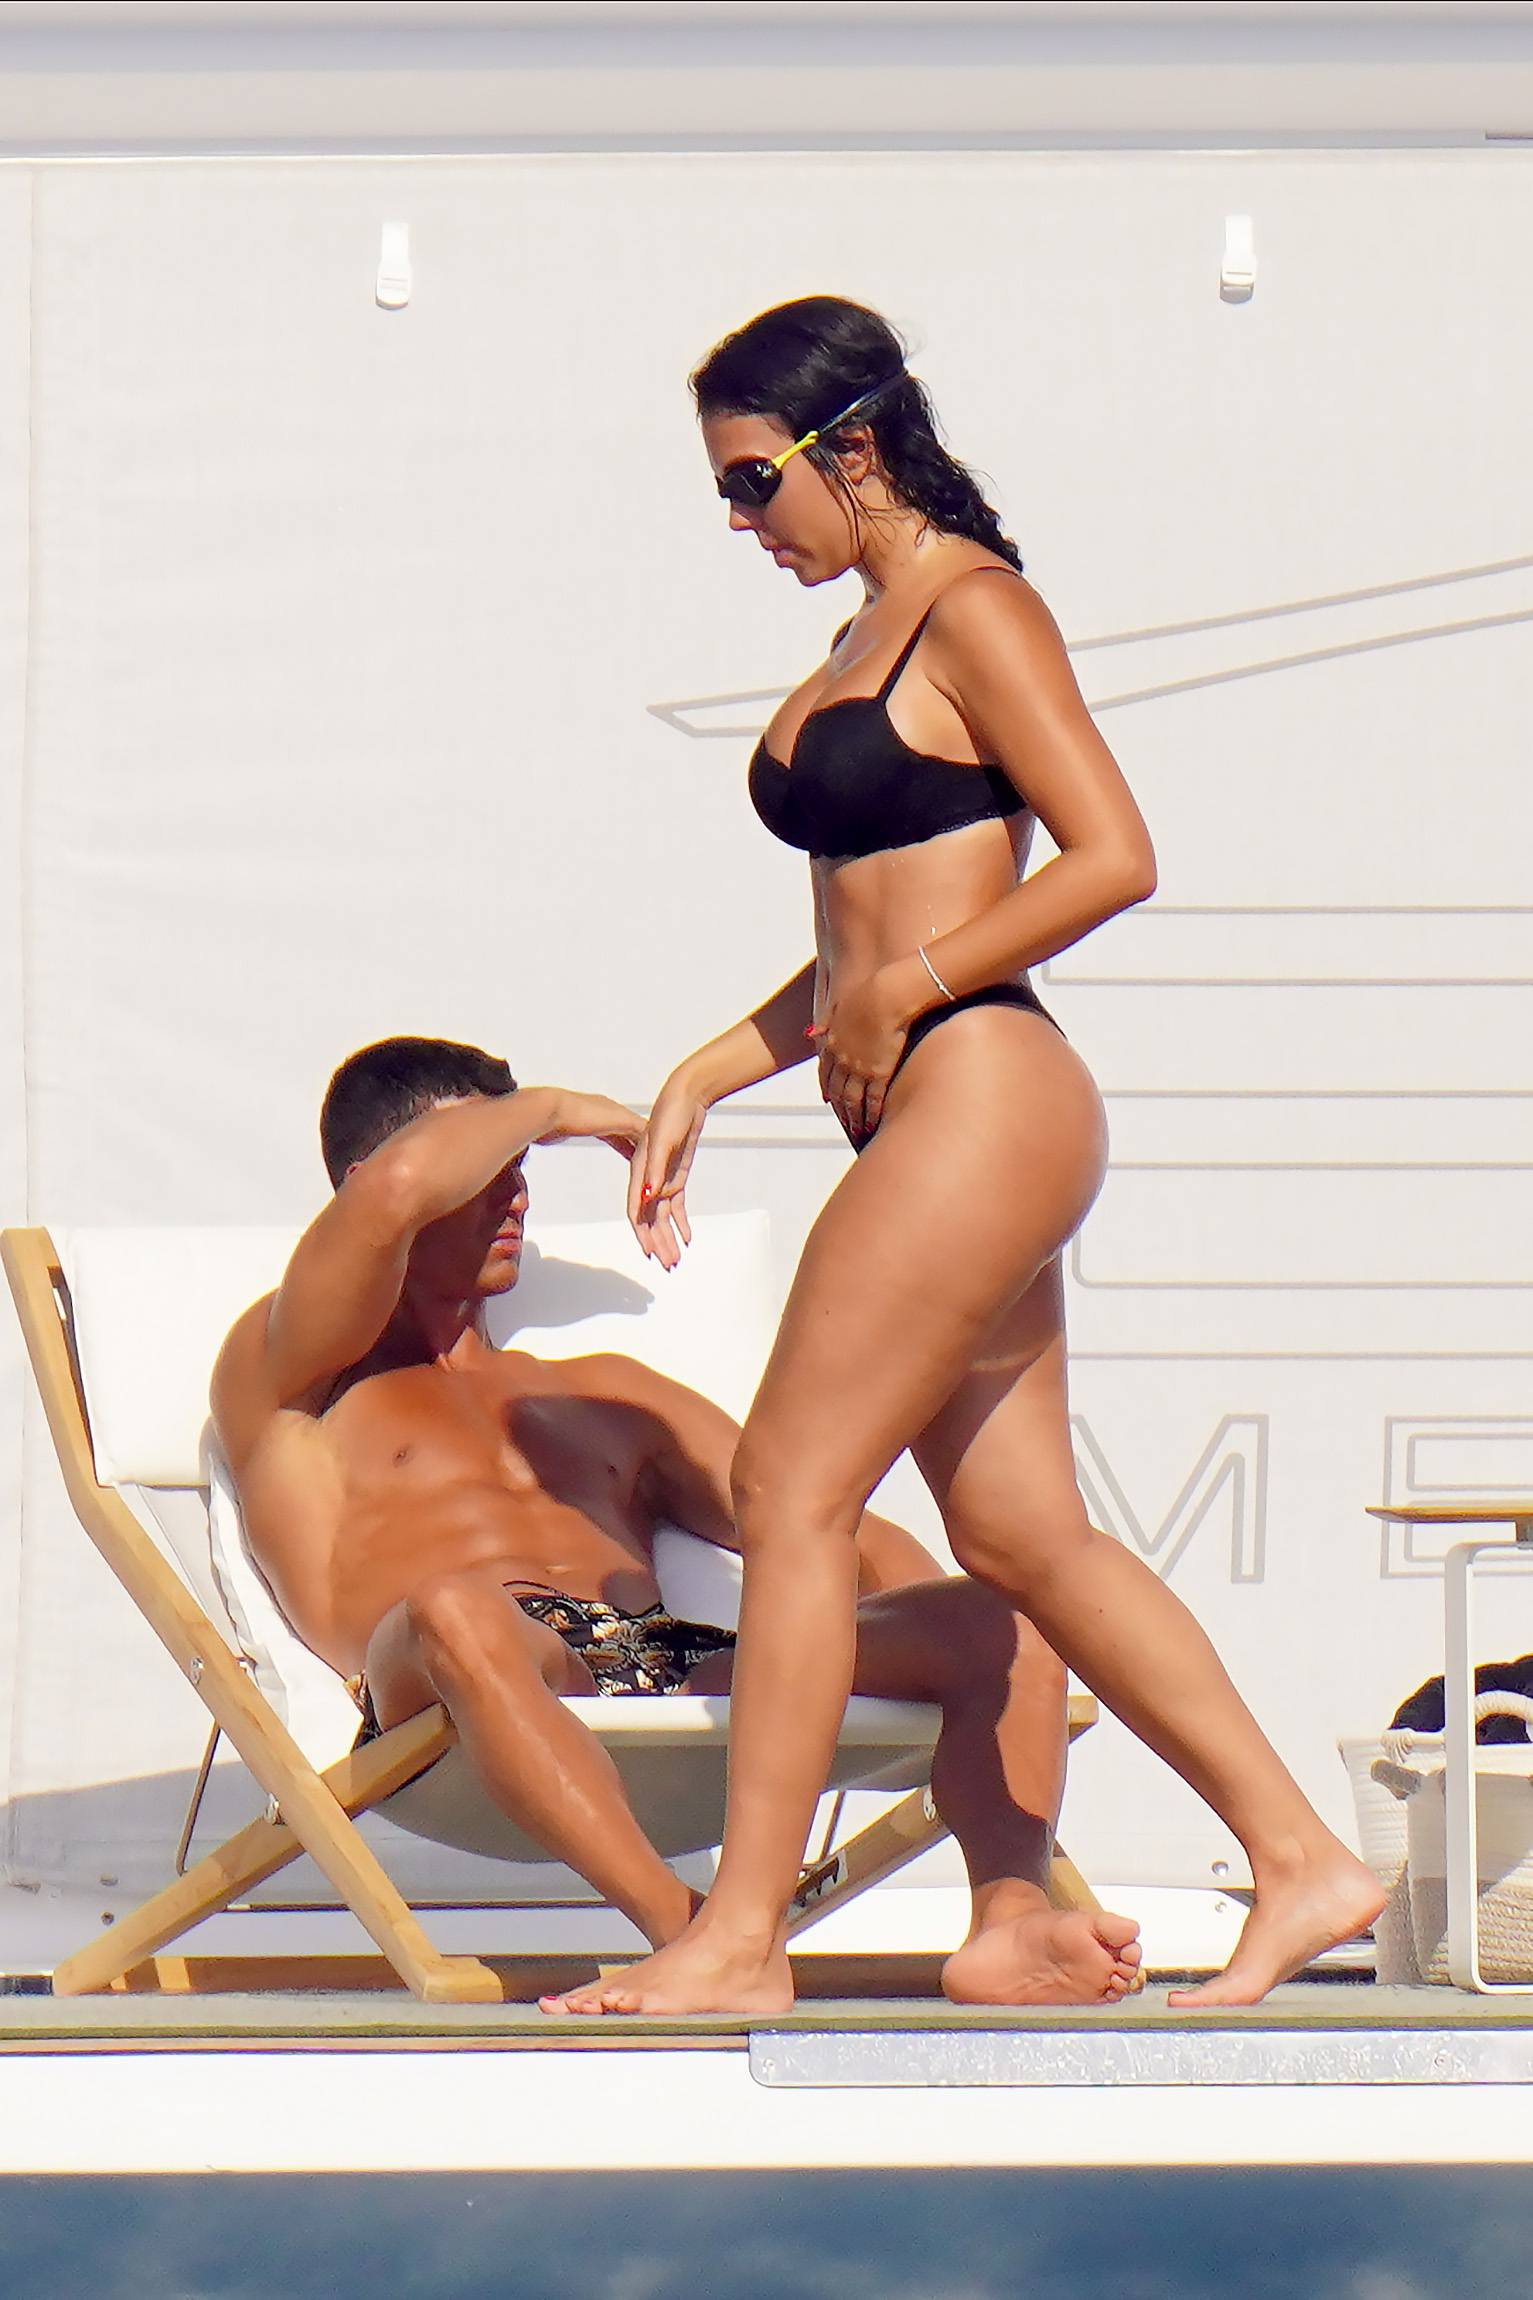 Georgina Rodriguez - Fantastic Body in a Thong Bikini on a